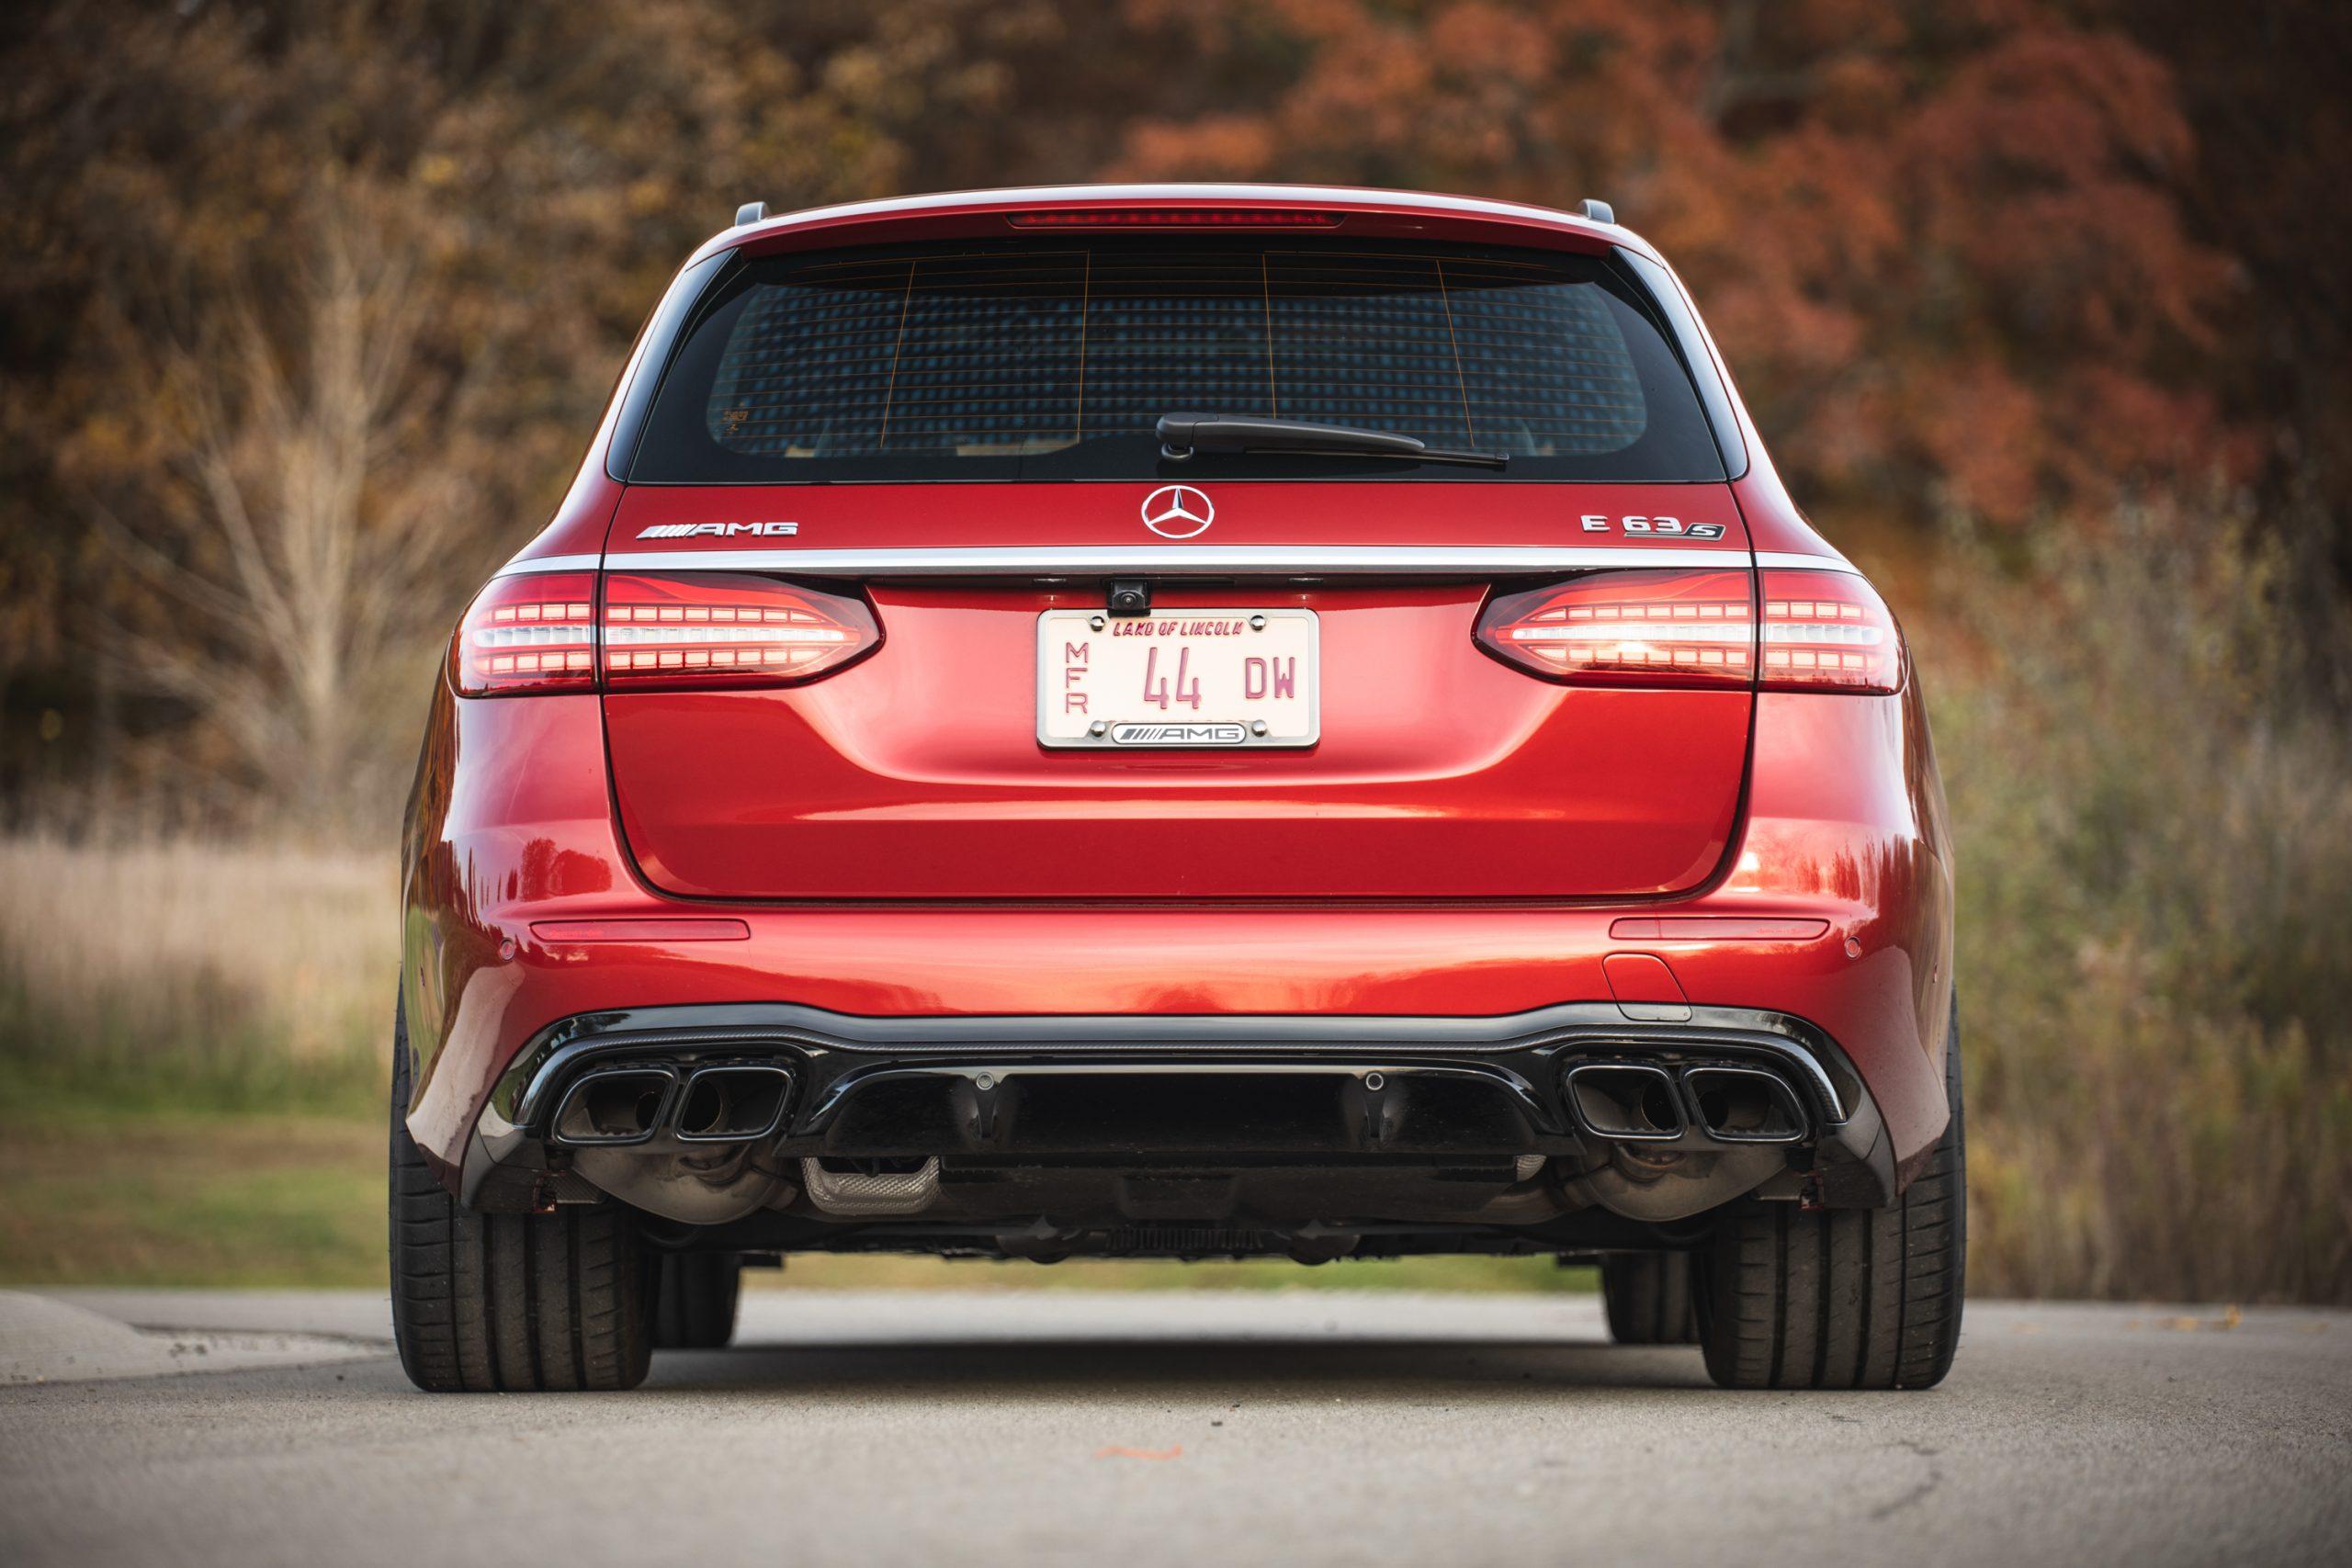 2021 Mercedes-AMG E63 S rear